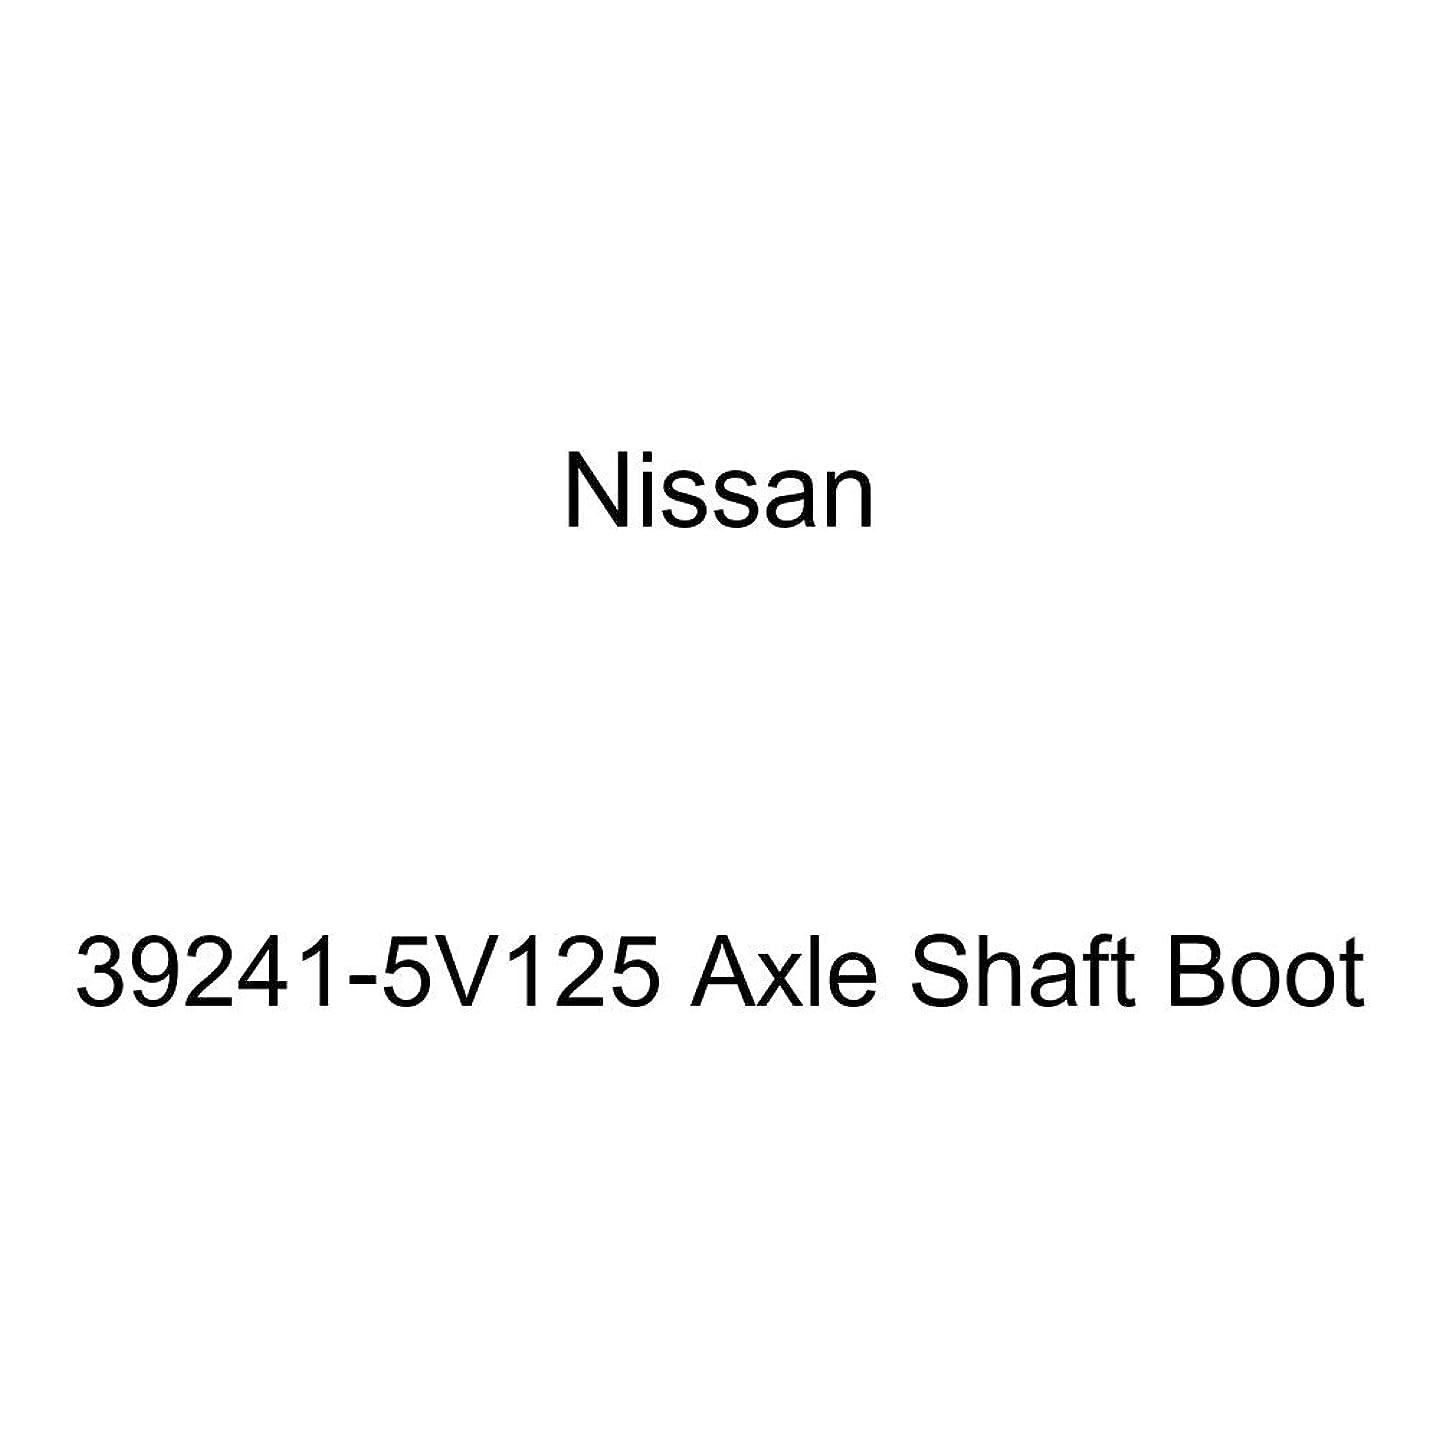 Genuine Nissan 39241-5V125 Axle Shaft Boot